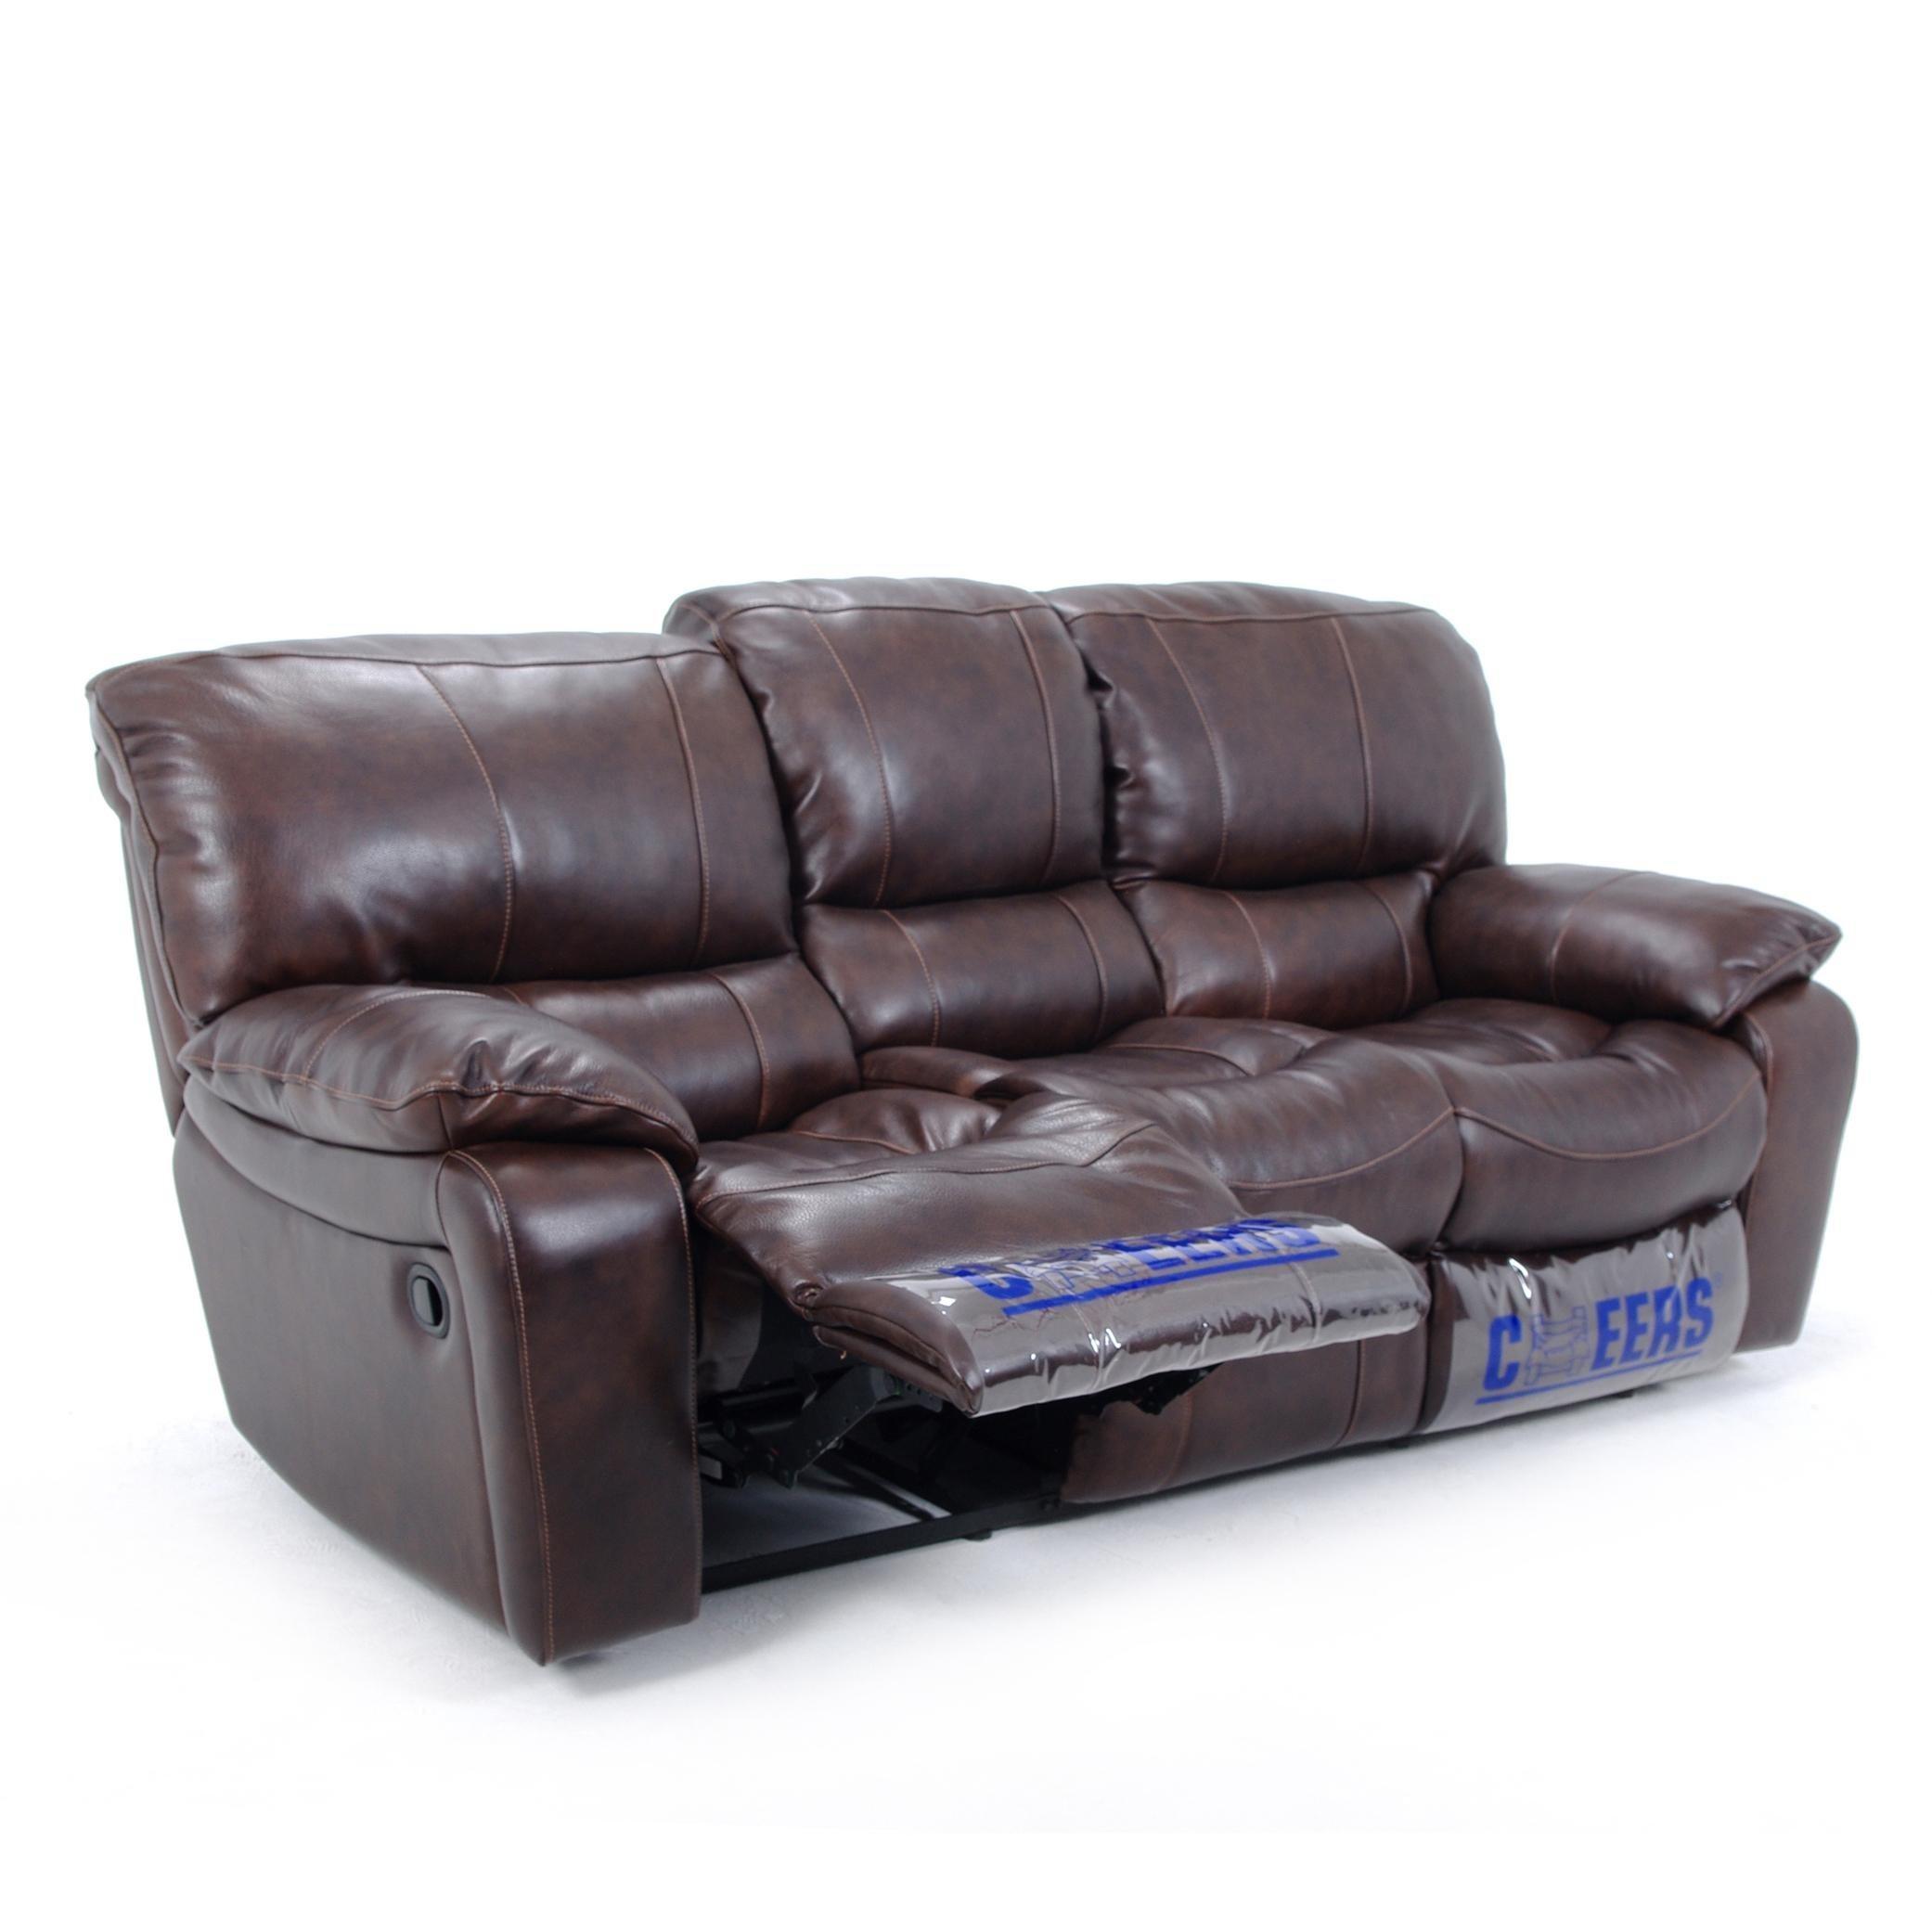 Cheers Leather Sofa 58 With Cheers Leather Sofa | Jinanhongyu Regarding Cheers Leather Sofas (Image 8 of 20)